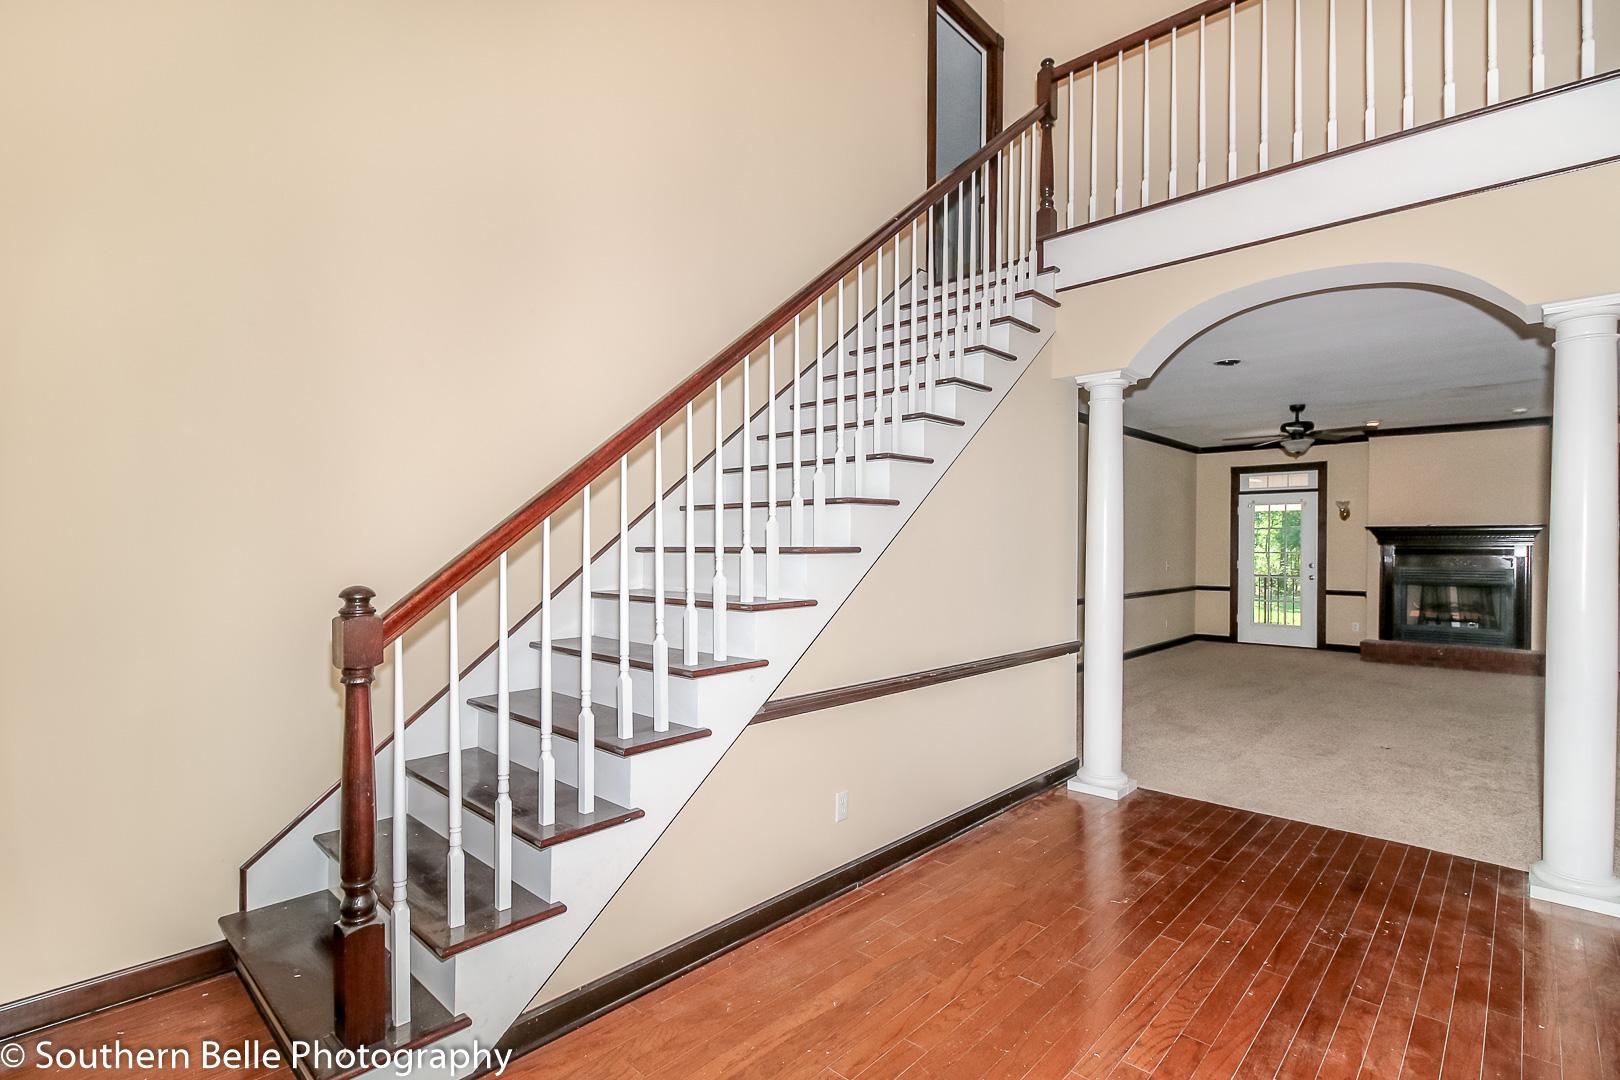 20. Staircase View WM